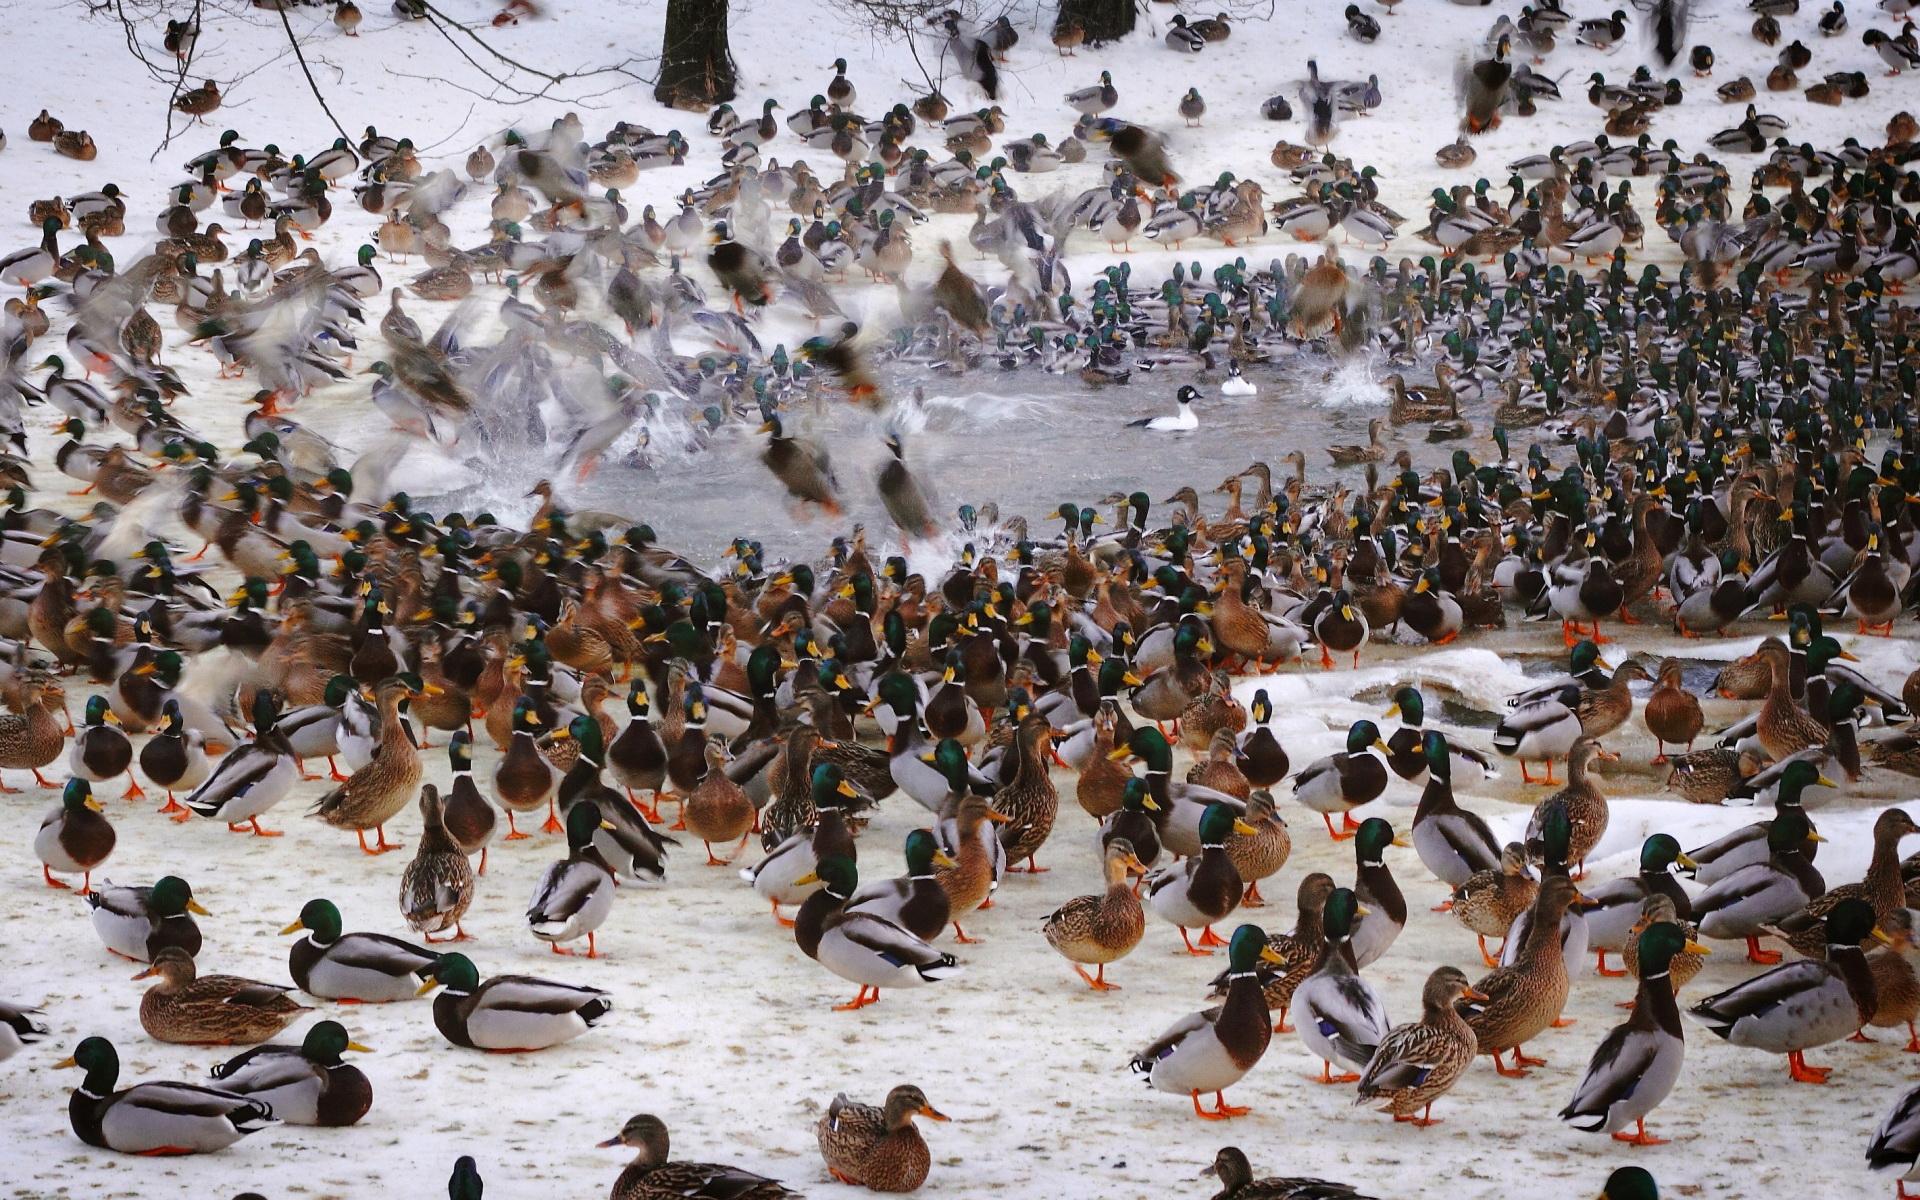 waterfowl fowl ducks flock wallpaper background 1920x1200